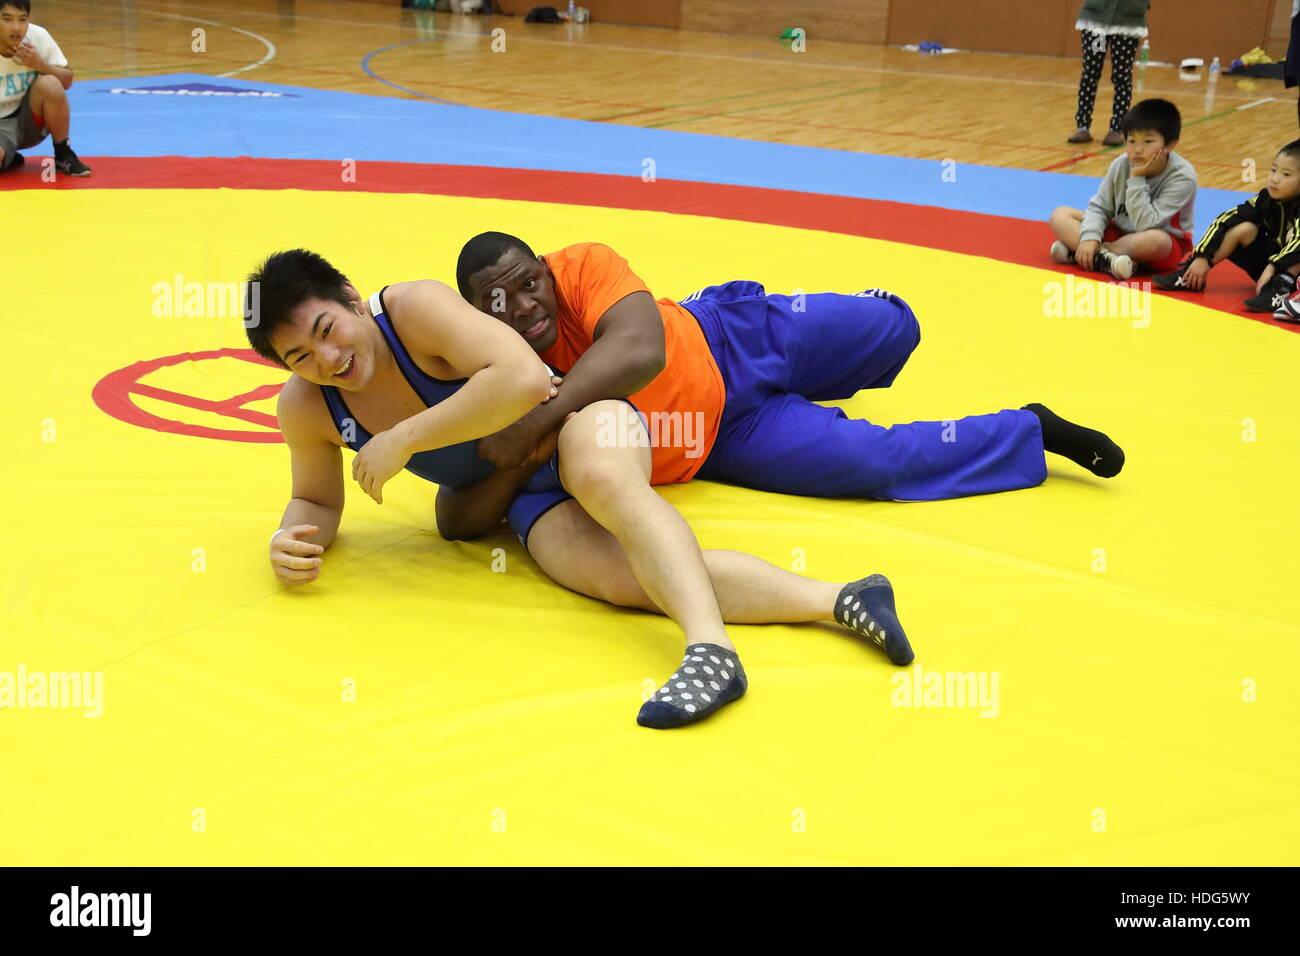 2016 Rio Olympics Men's Greco-Roman 130kg Gold medalist